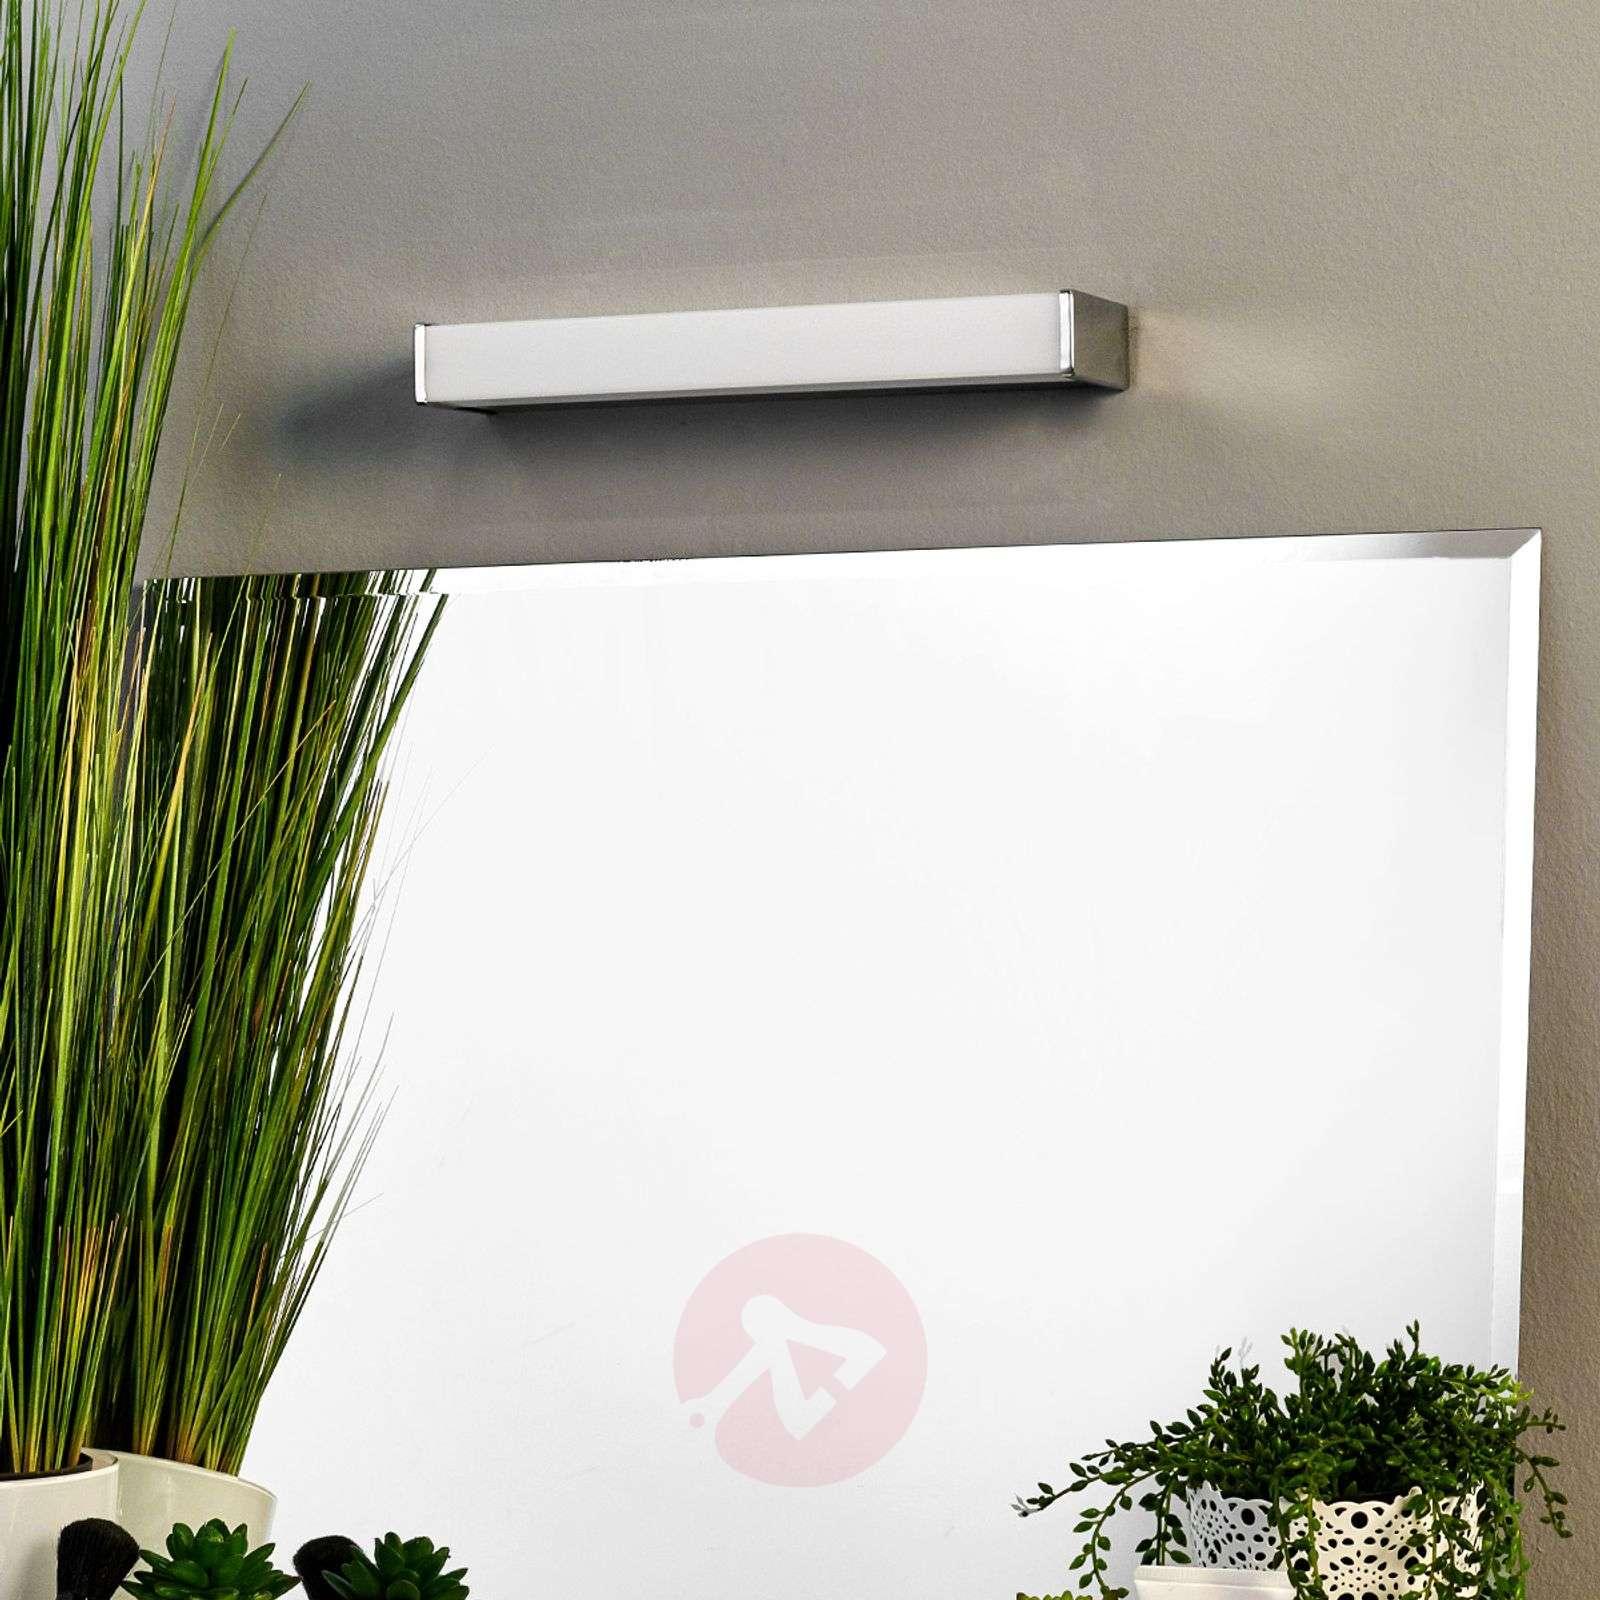 Philippa bathroom/mirror light angular 32cm-9641014-02